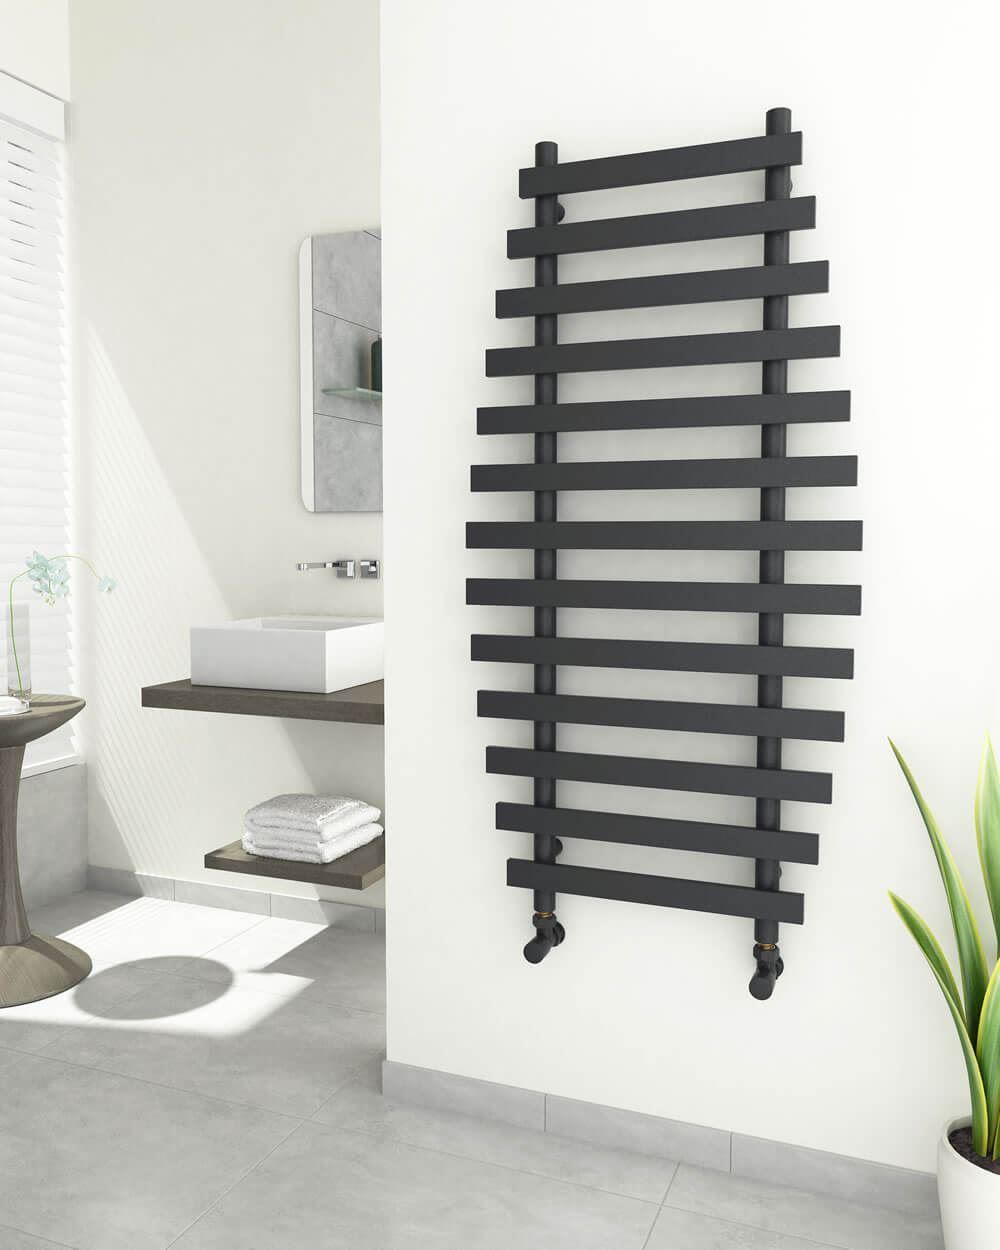 DIVERI Anthracite Bathroom Towel Radiator 600mm Wide ...